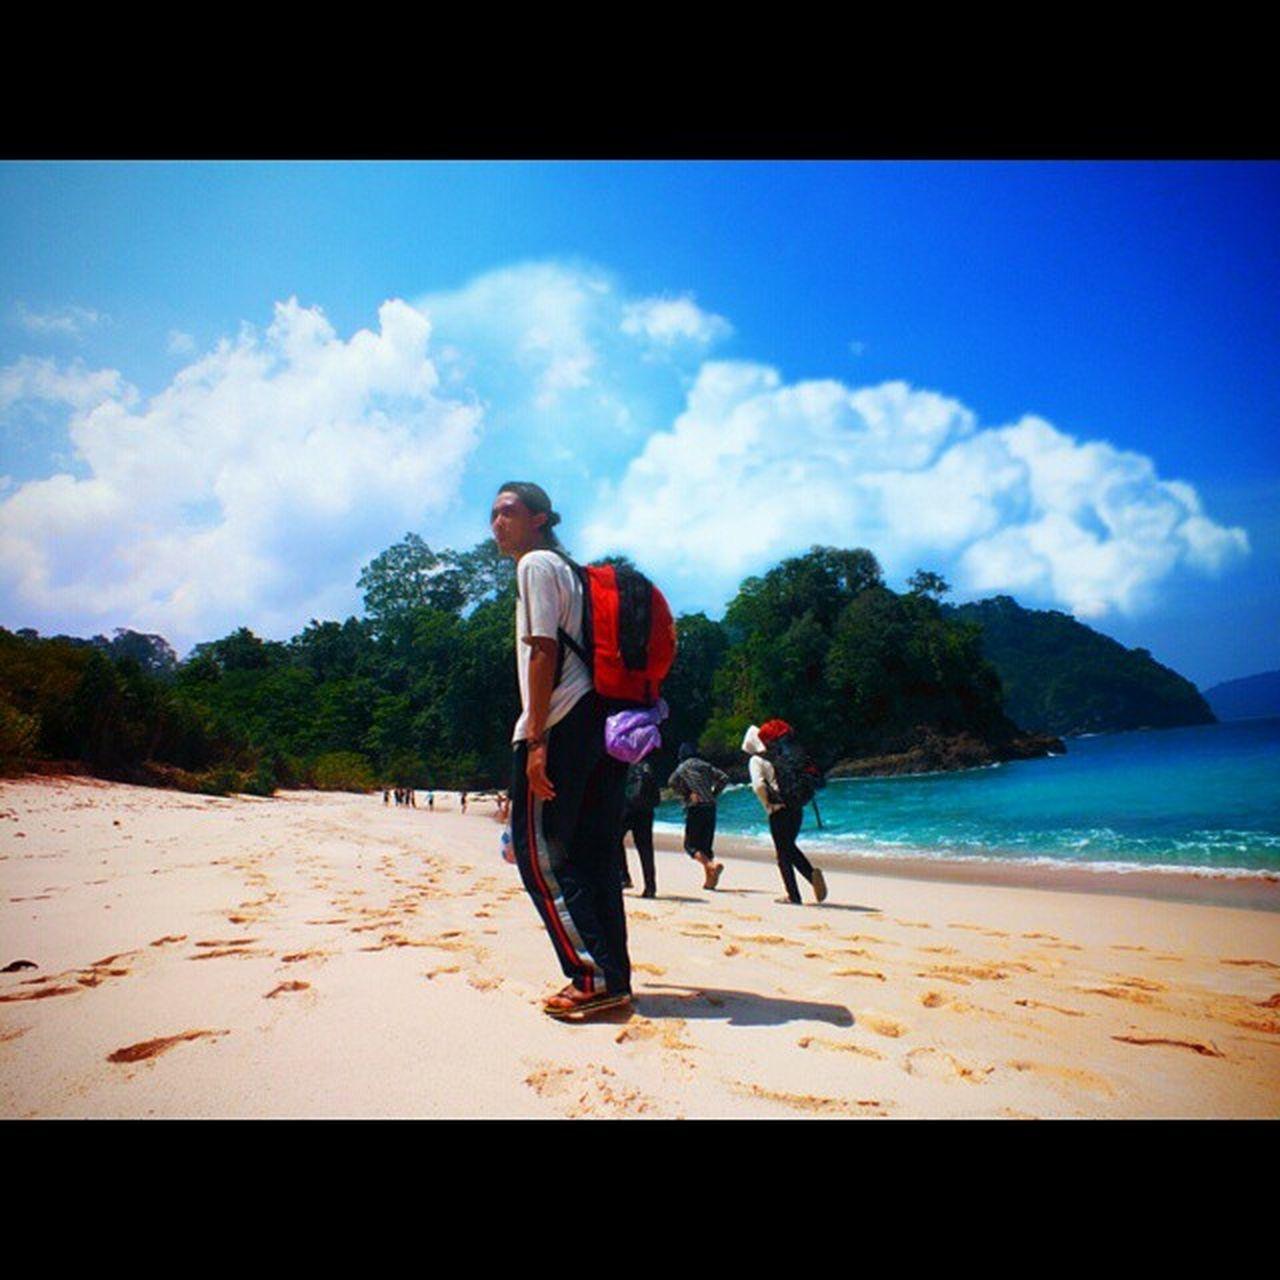 Kembali pulang....kembali beraktivitas.. Adventure INDONESIA Greenbay Beach Explorebanyuwangi Exploreindonesia Travelerhore Travelingindonesia Jalan2terus Ayodolan